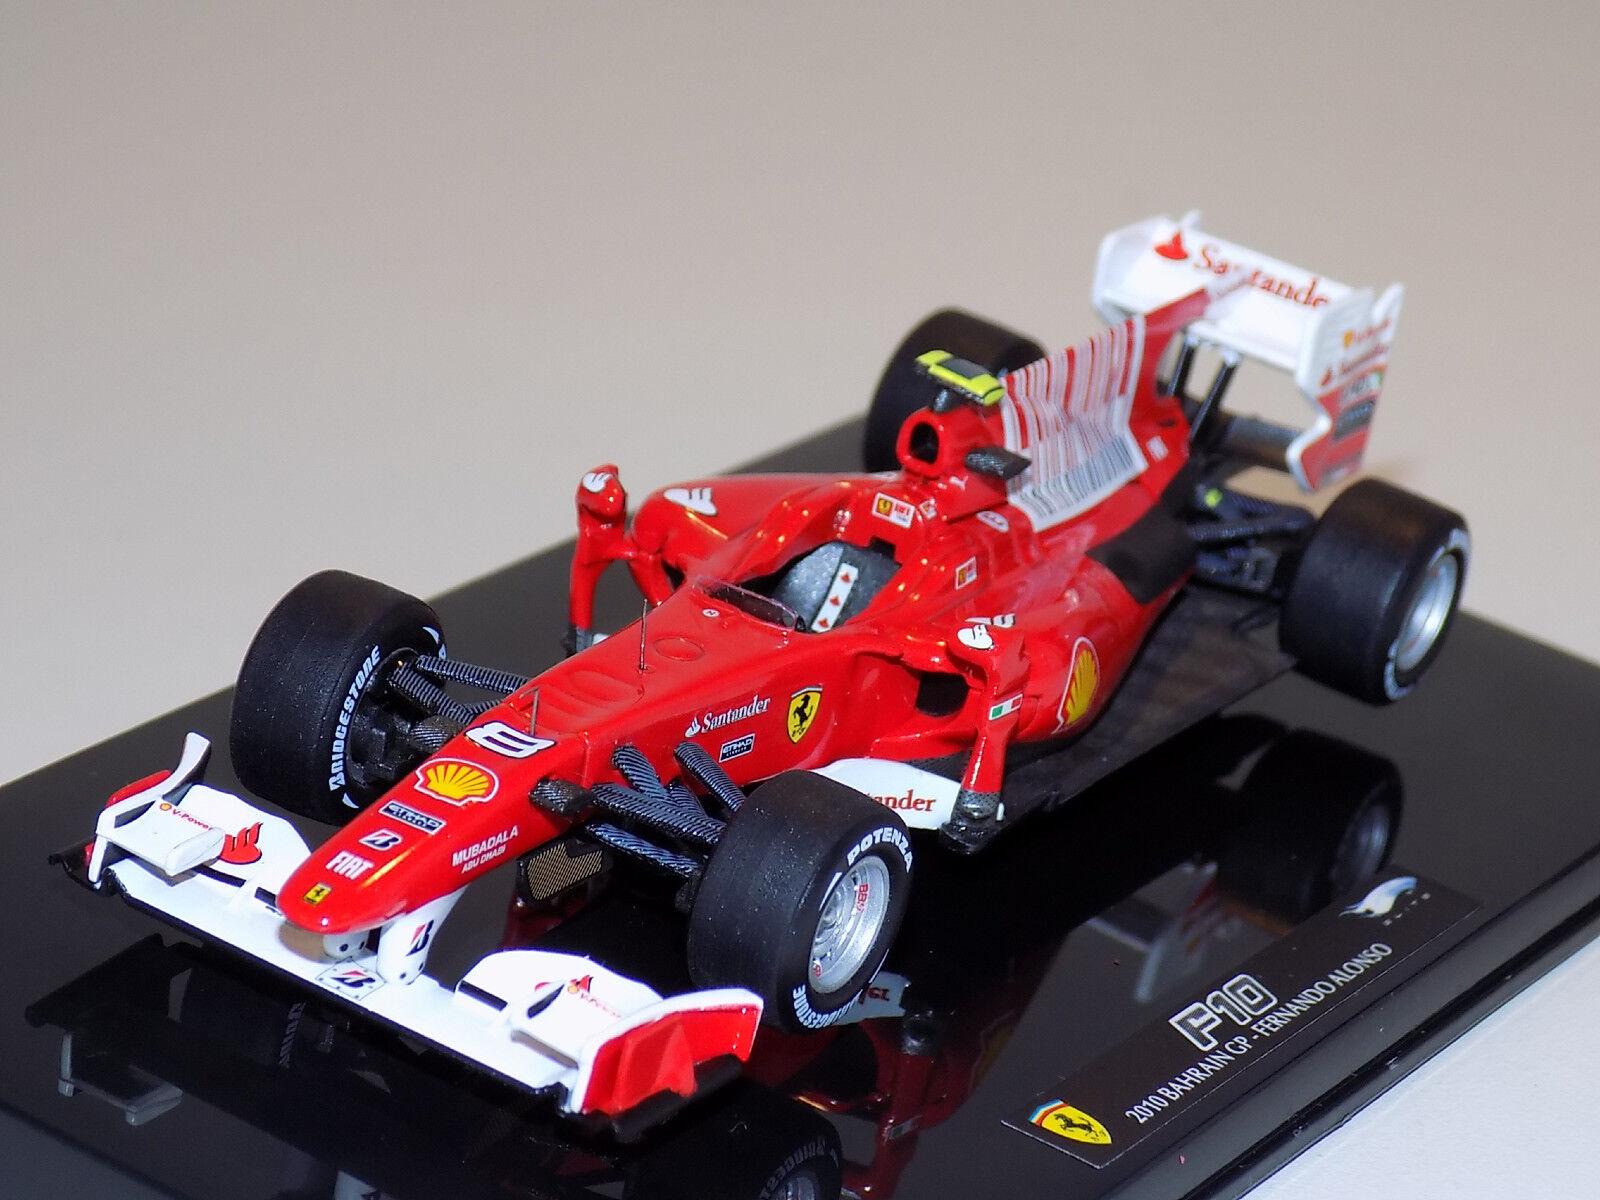 1 43 Mattell varm Wheels F1 Ferrari F10 Vinnare Grand Prix Bahrain Alonso